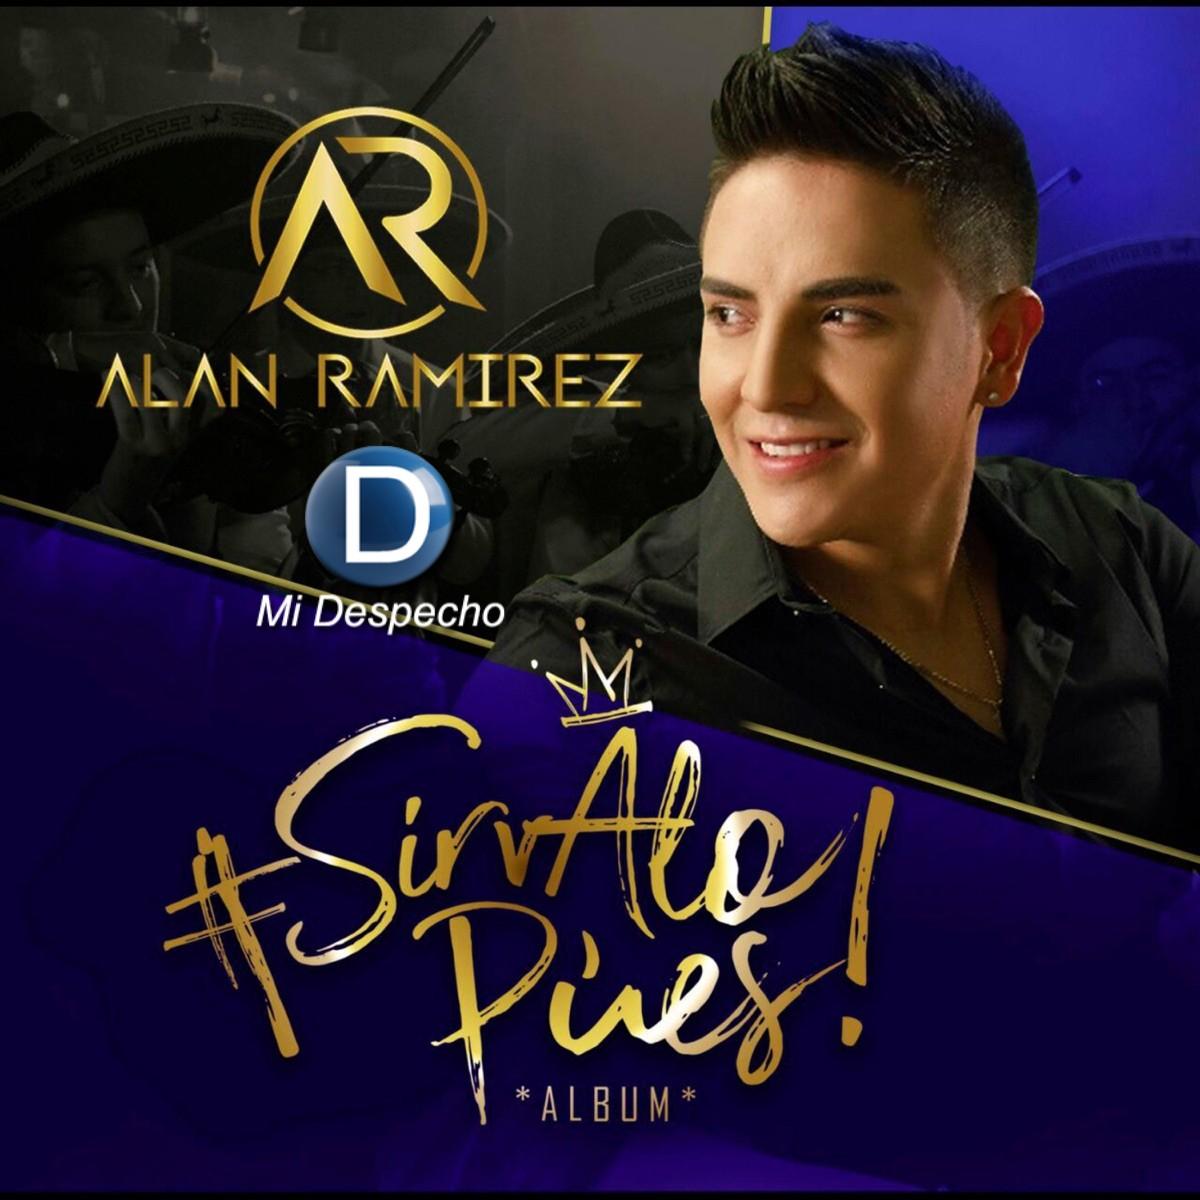 Alan Ramírez Sirvalo Pues Frontal